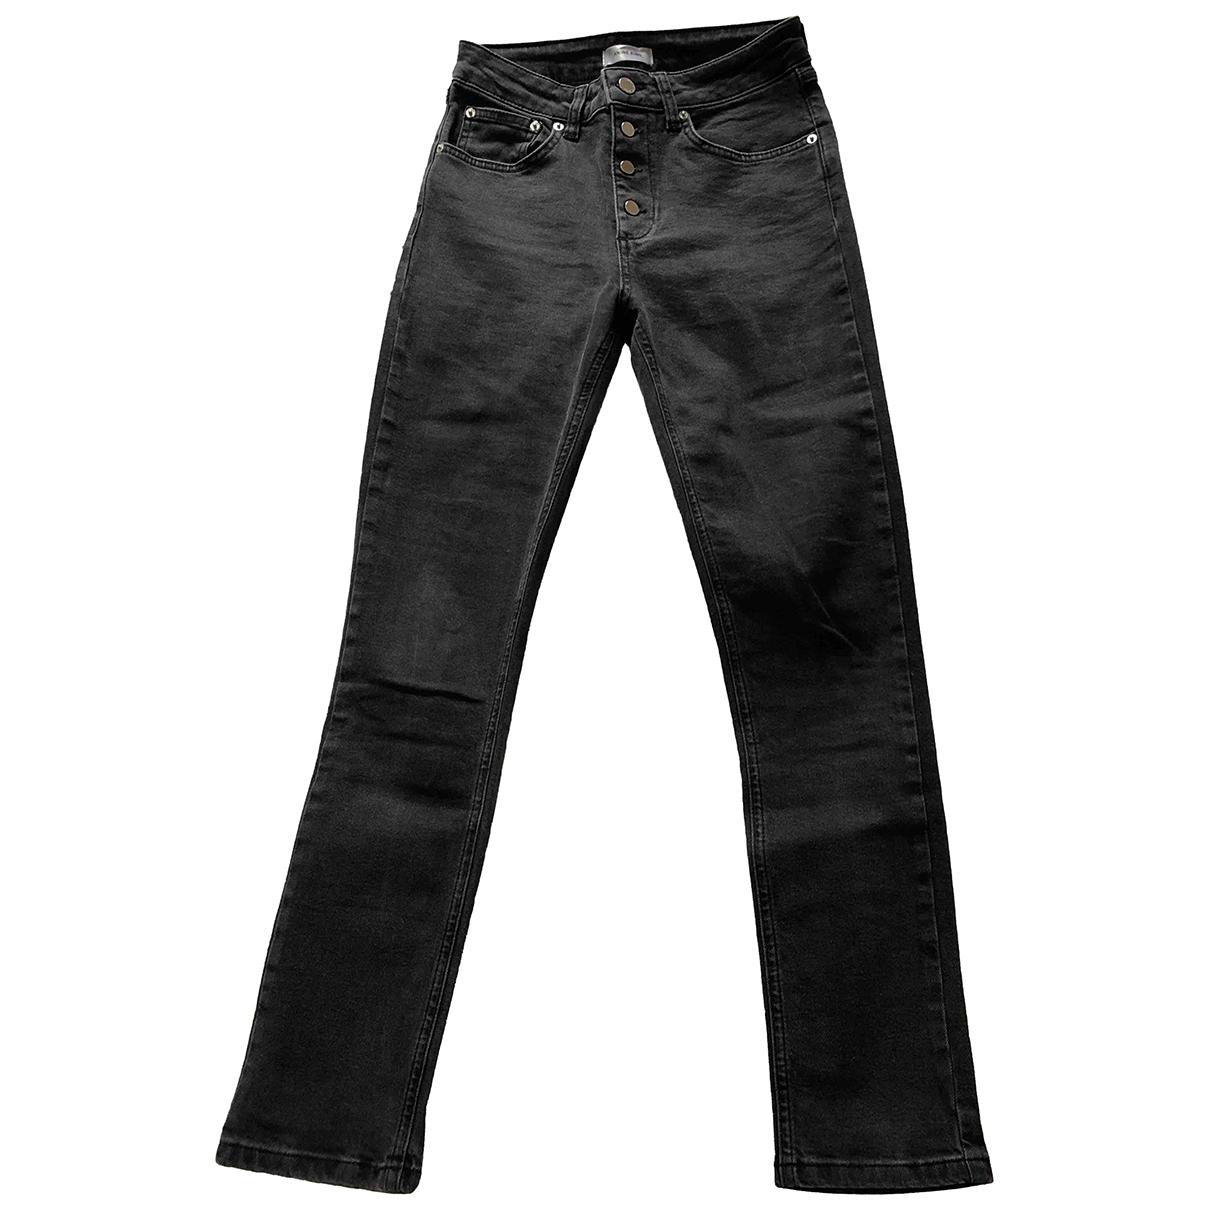 Anine Bing \N Grey Cotton - elasthane Jeans for Women 27 US